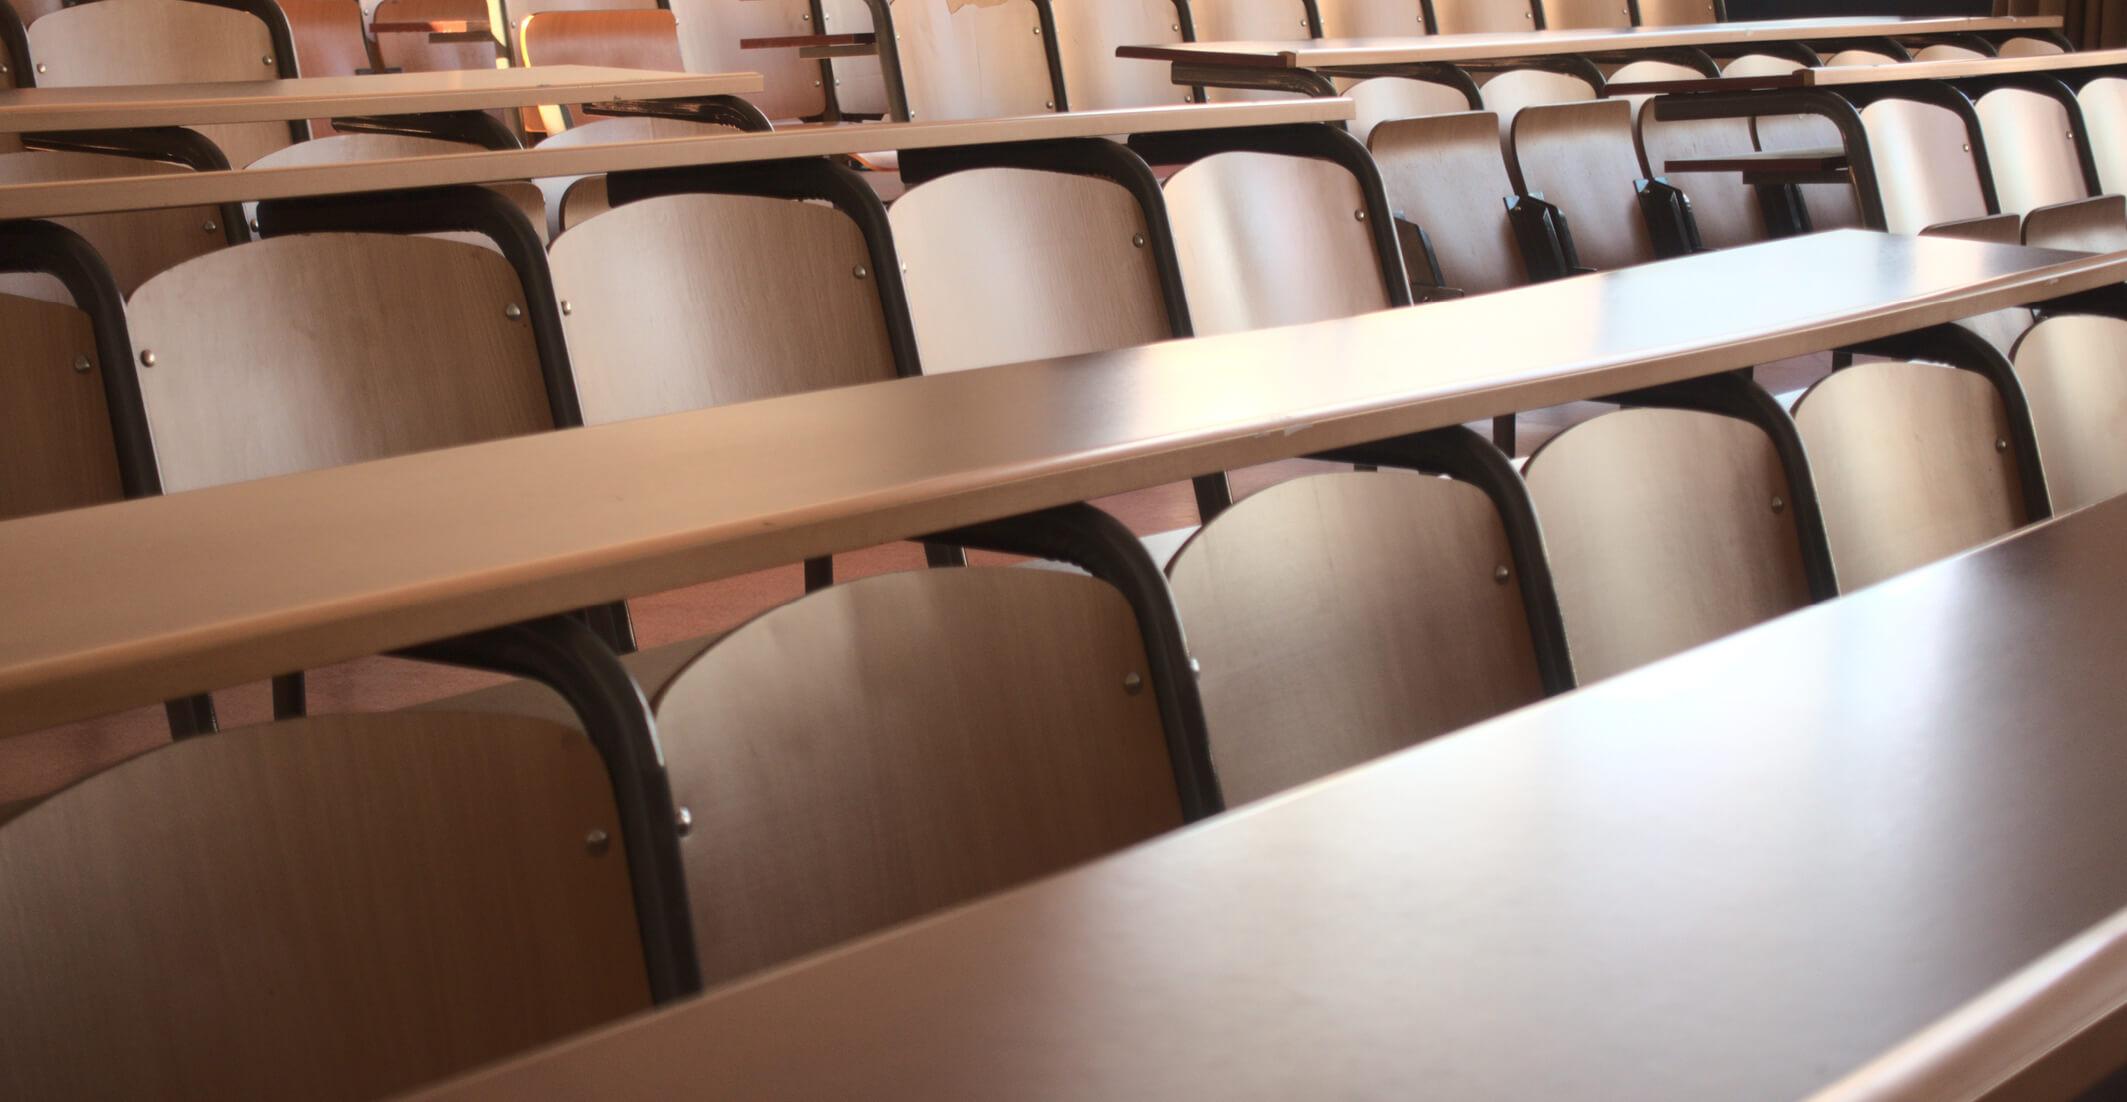 Collusion in the Classroom